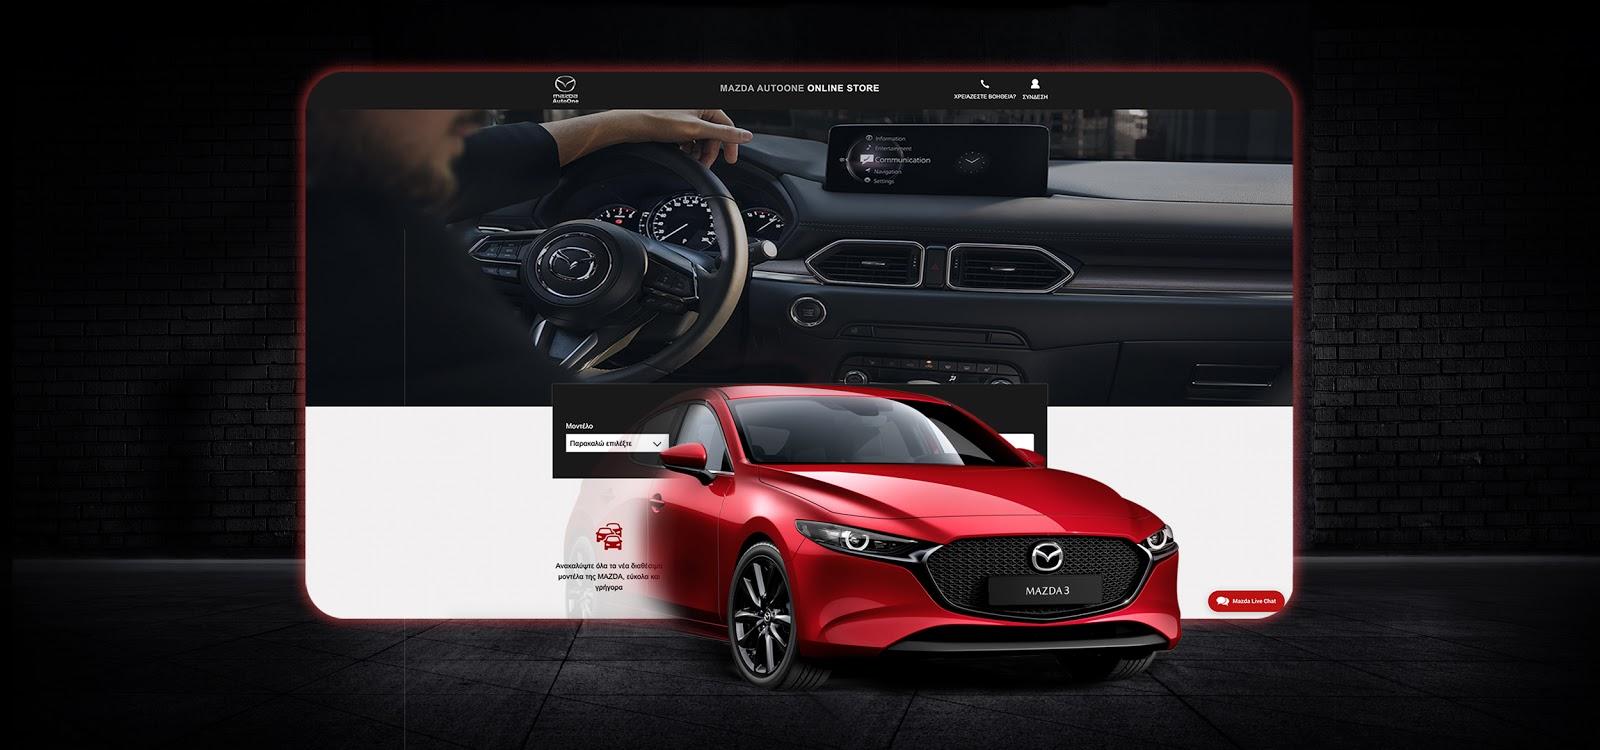 Mazda onlline store MAZDA ONLINE STORE : Το νέο σας Mazda, με μερικά κλικ